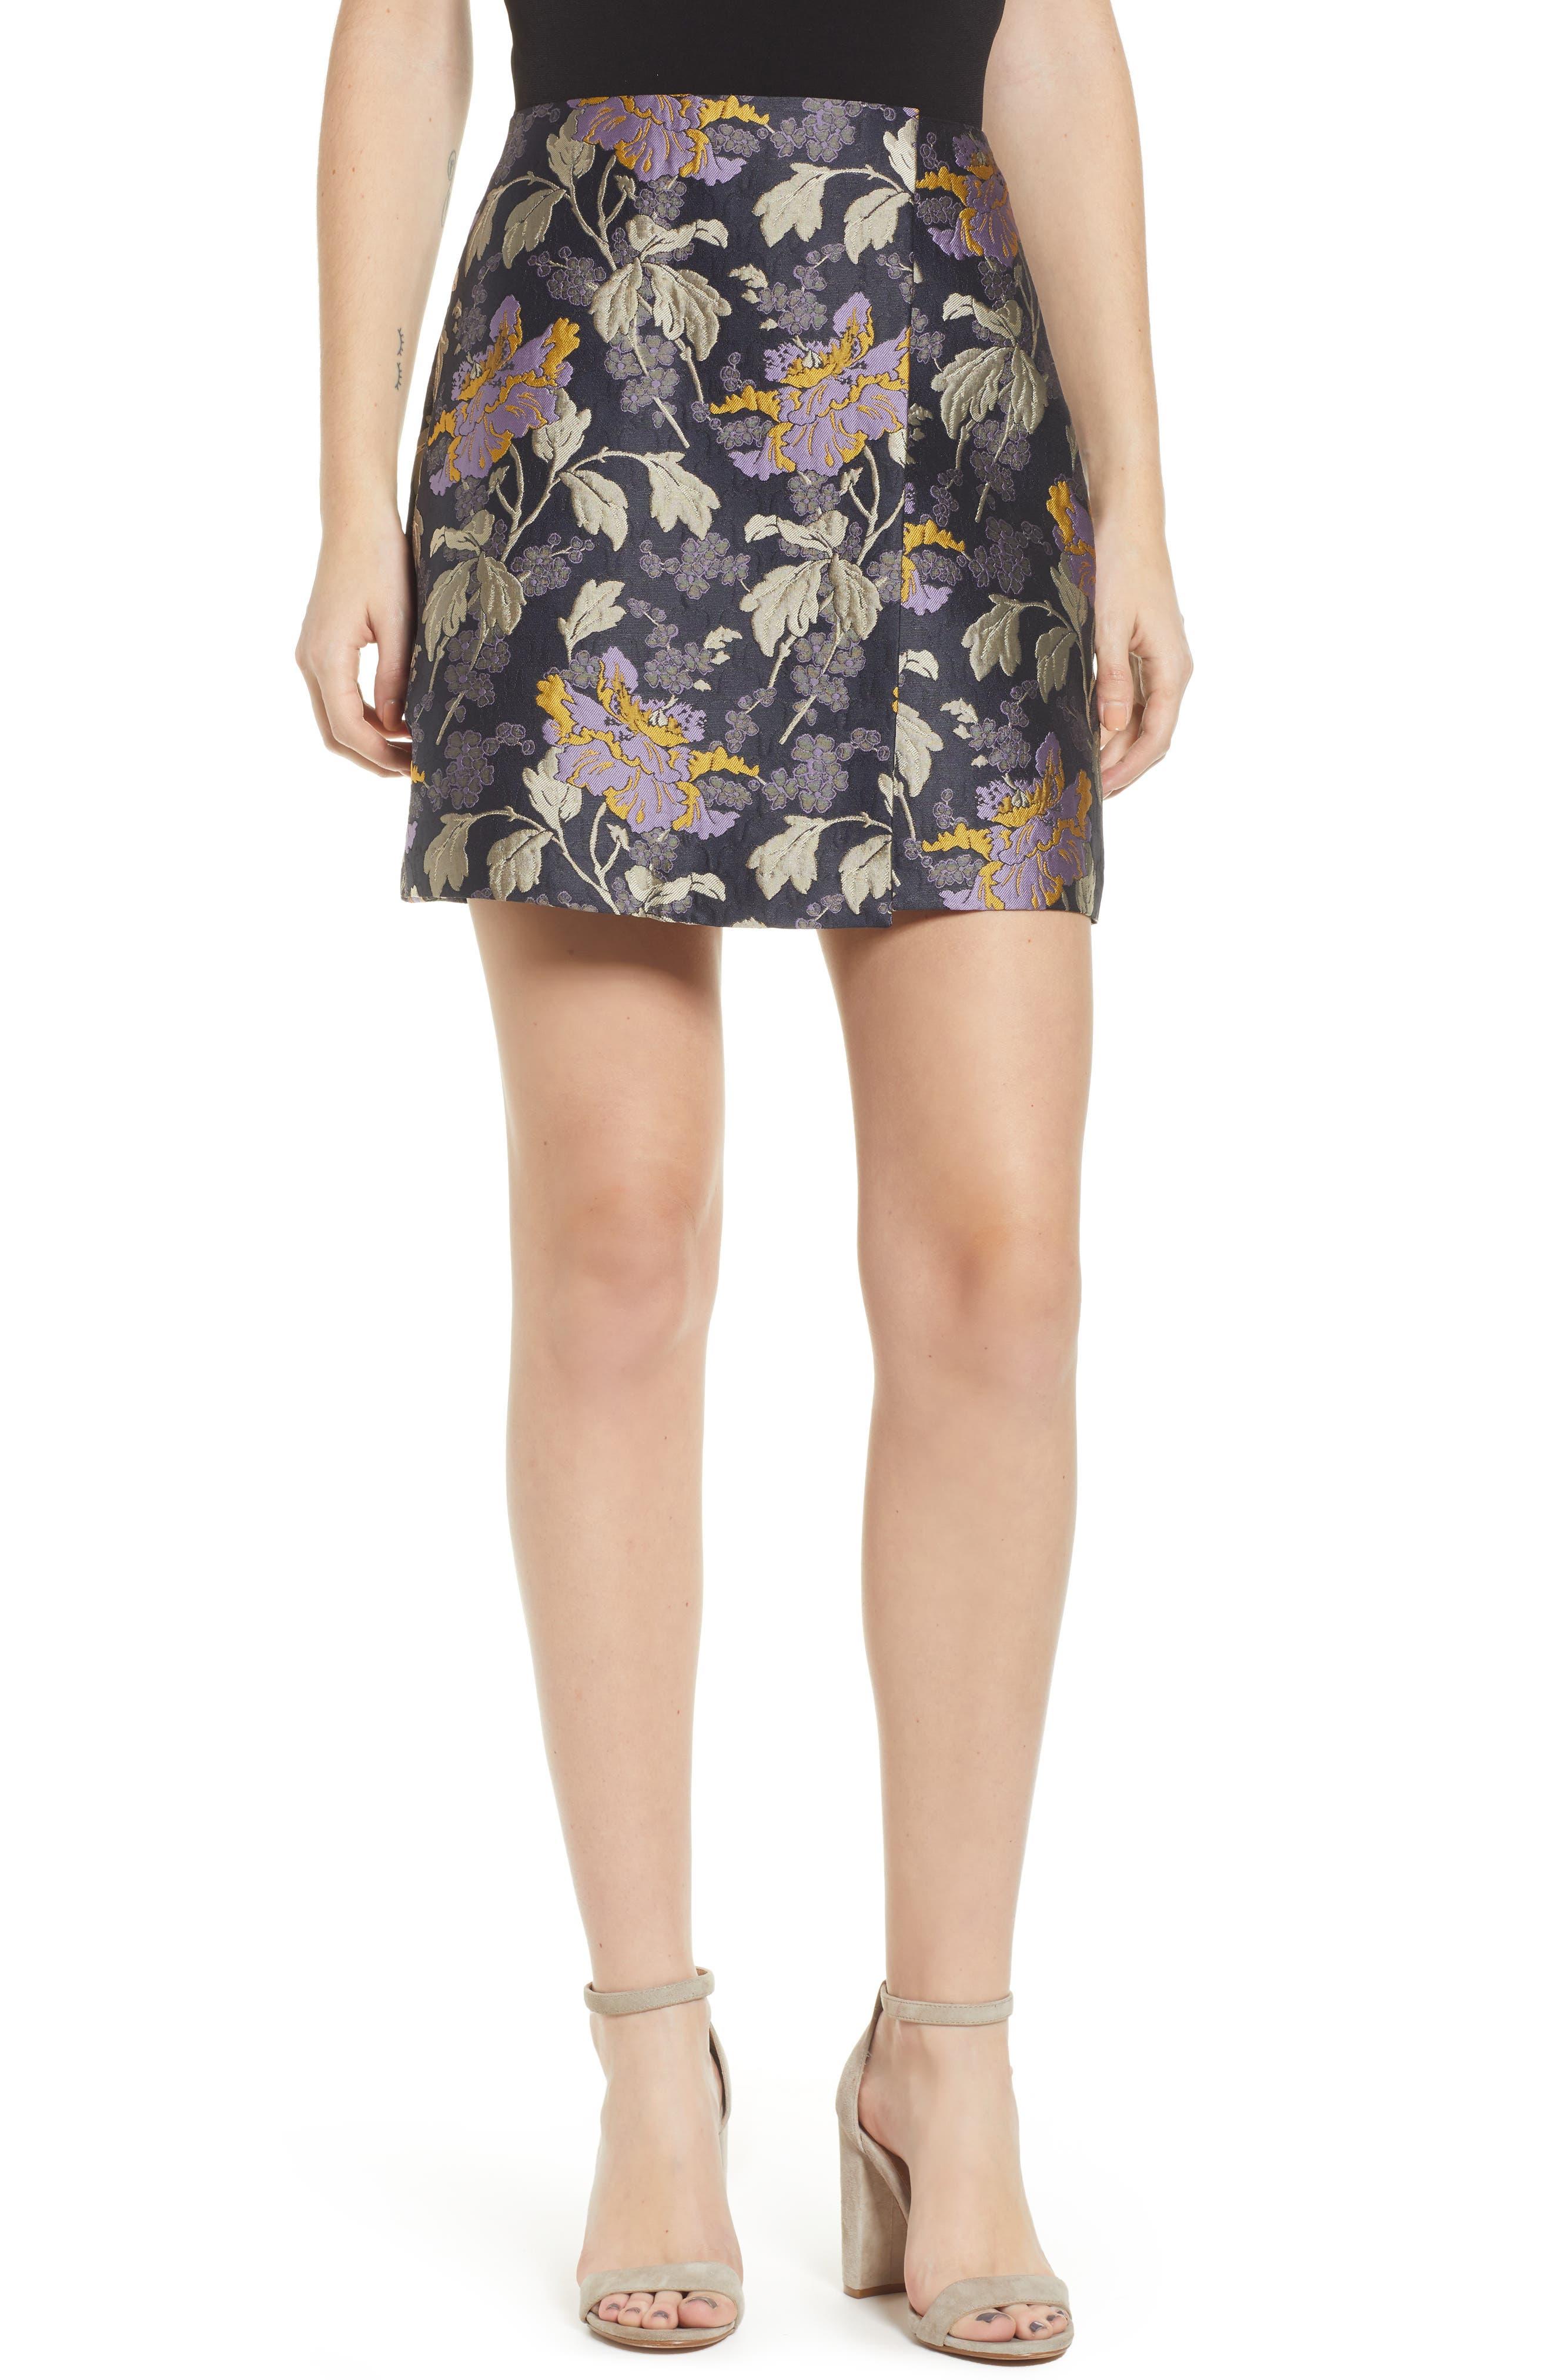 Vero Moda Freya Brocade Miniskirt, Blue